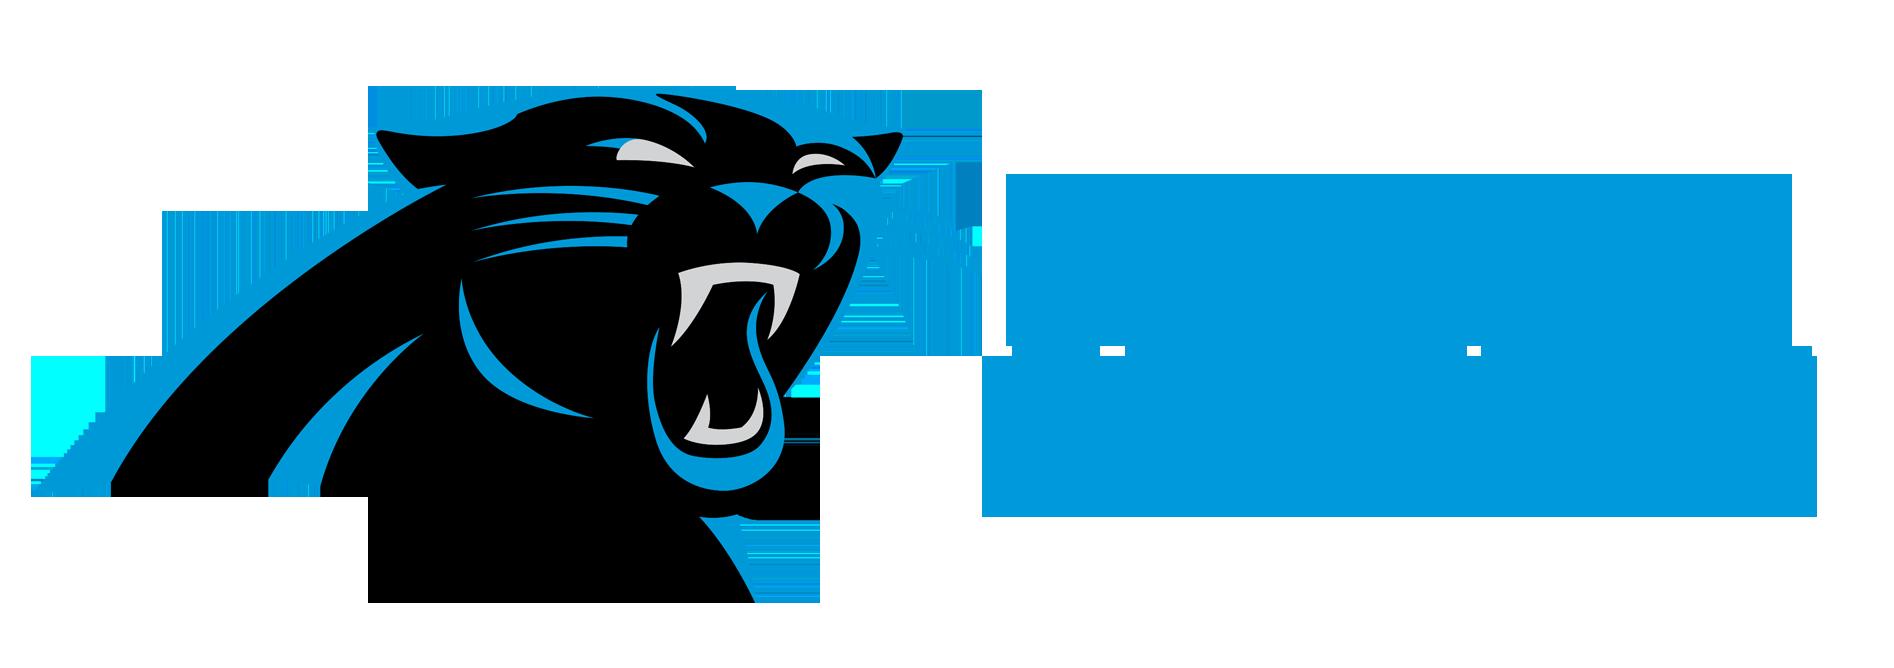 Panther clipart angry Art Panthers Carolina Cliparts Panthers